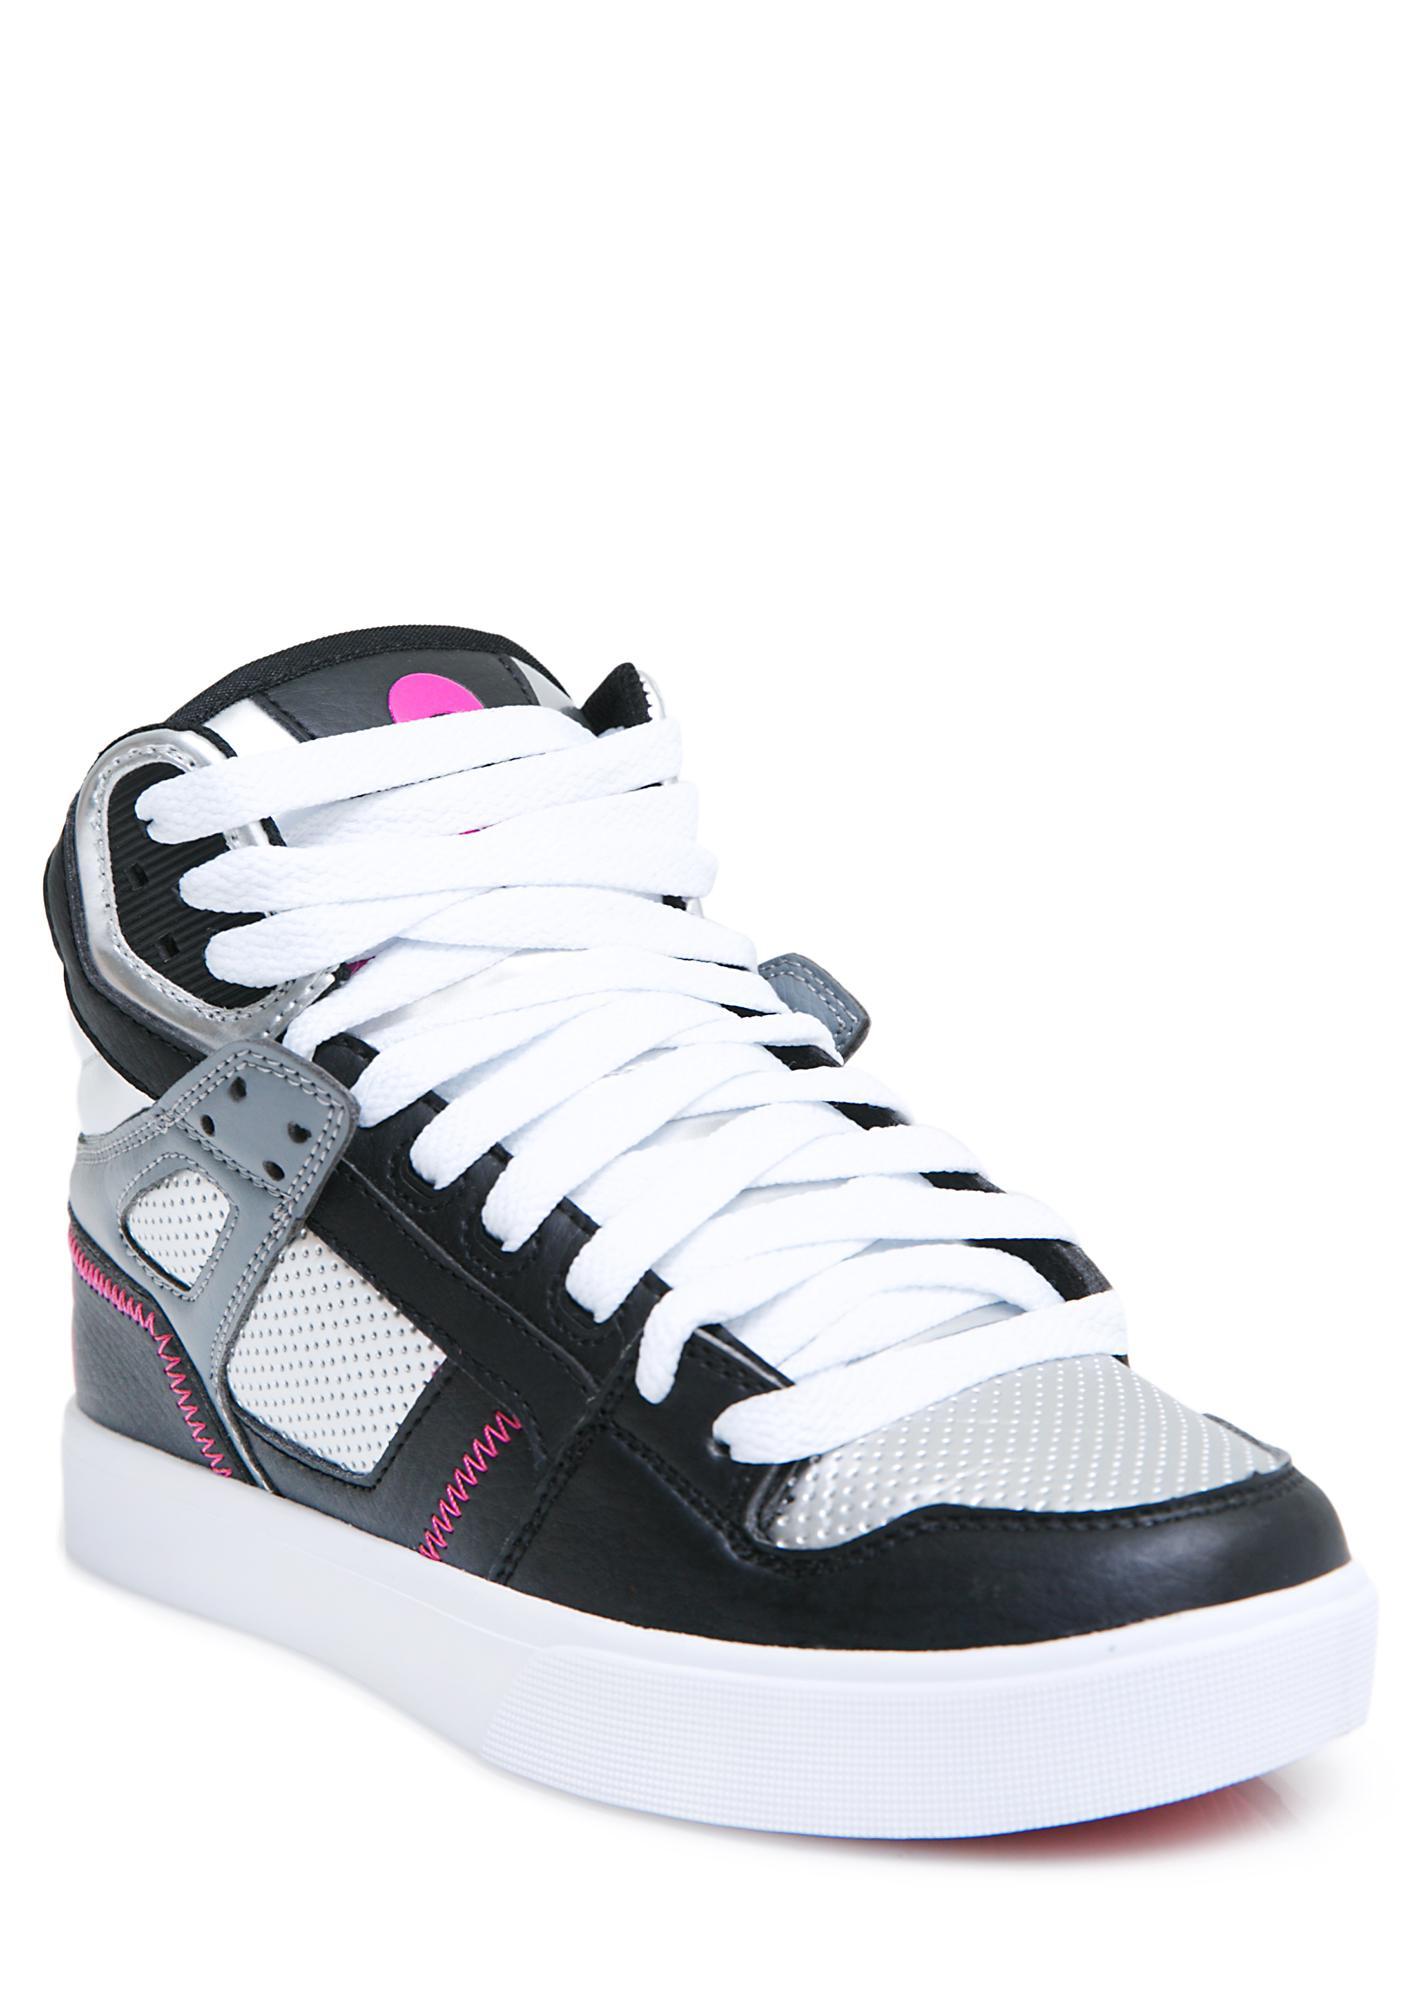 Osiris Stone Clone Sneakers